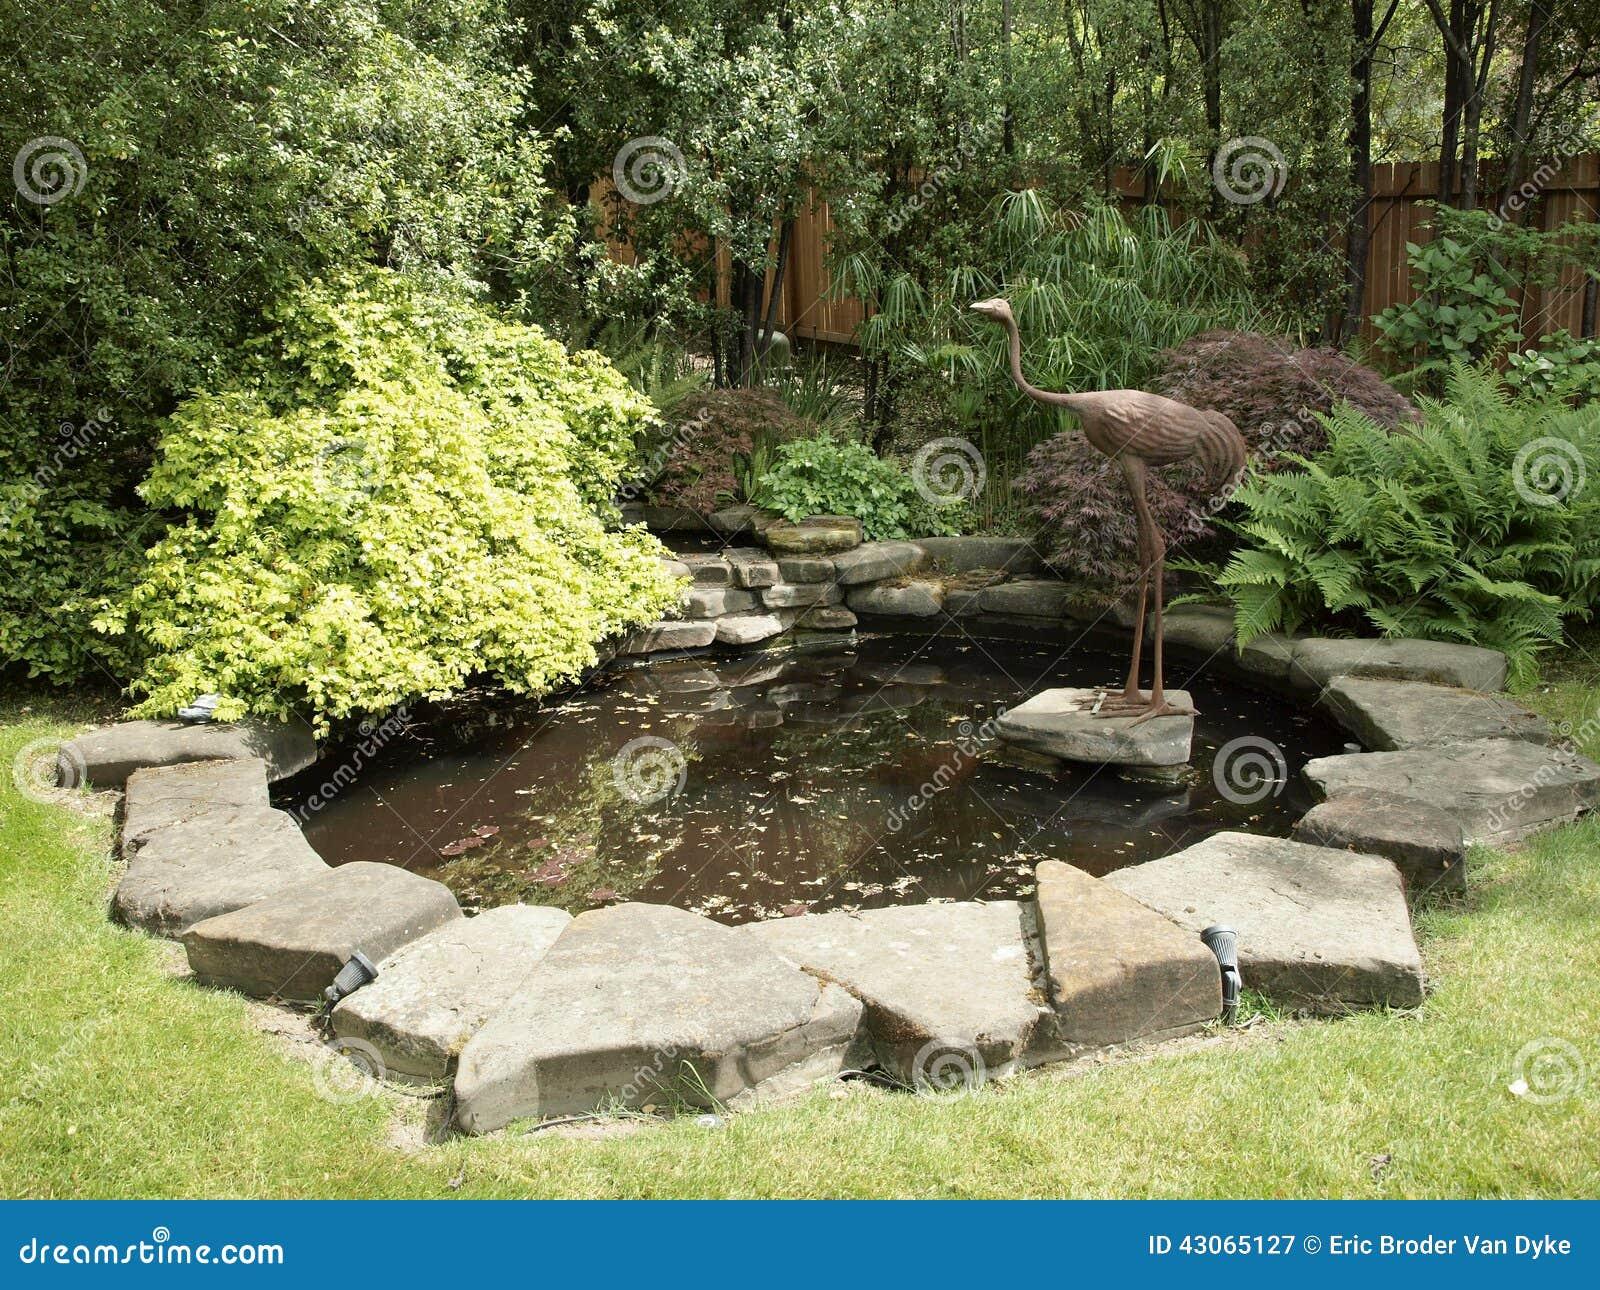 Stsatuette For Outdoor Ponds: Garden Pond With Bird Crane Bronze Statue Stock Image